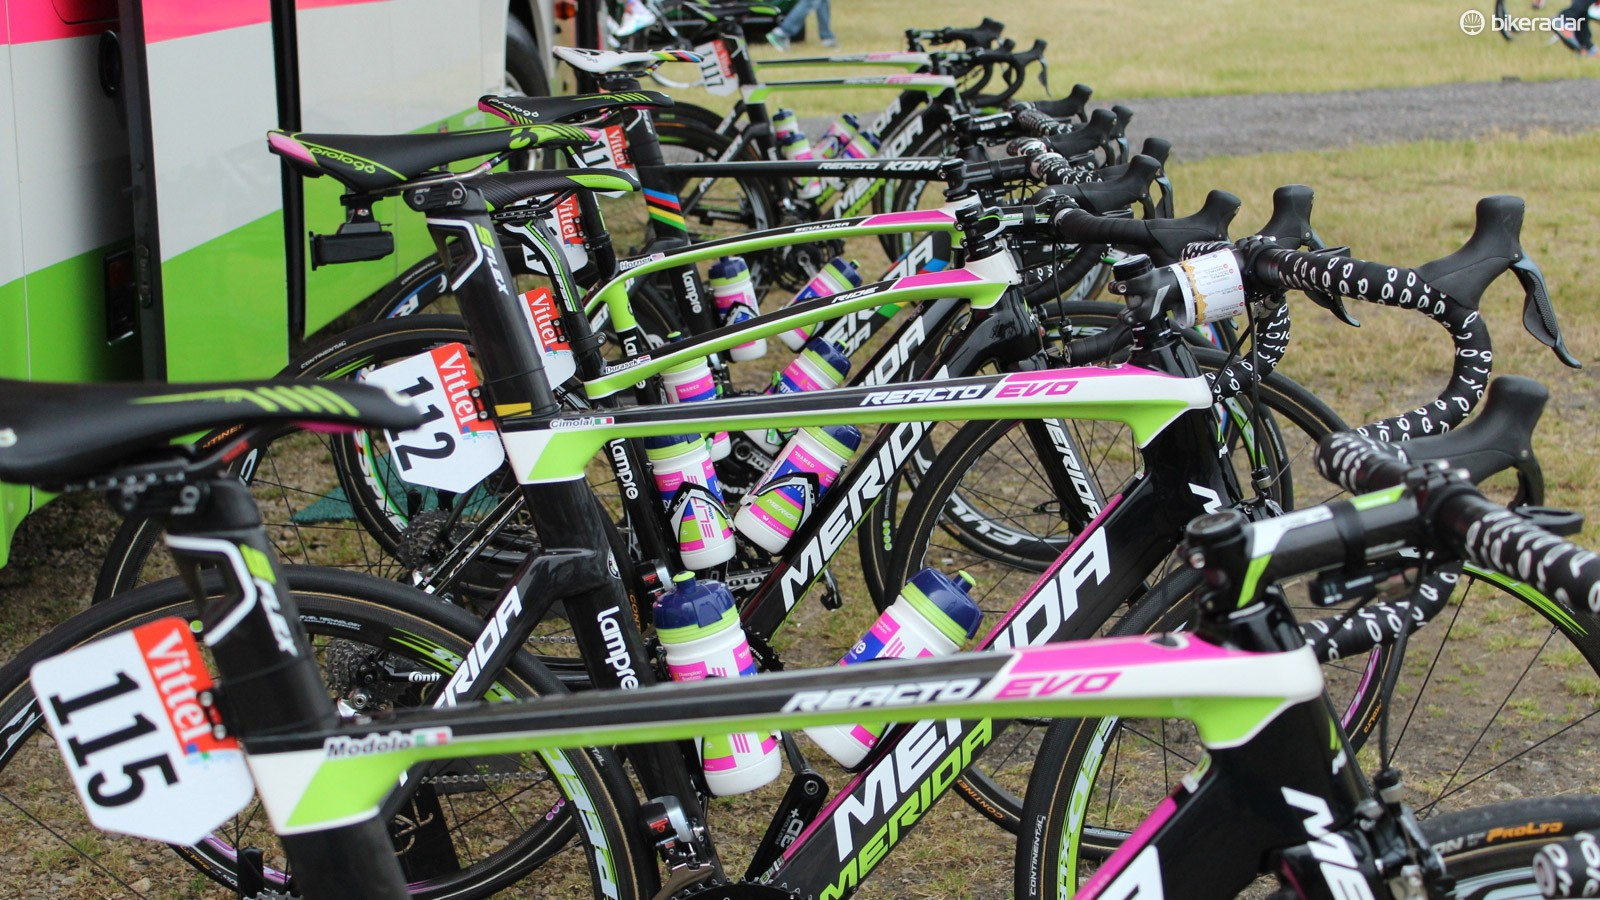 Lampre-Merida have no less than five different road bike models at the Tour de France